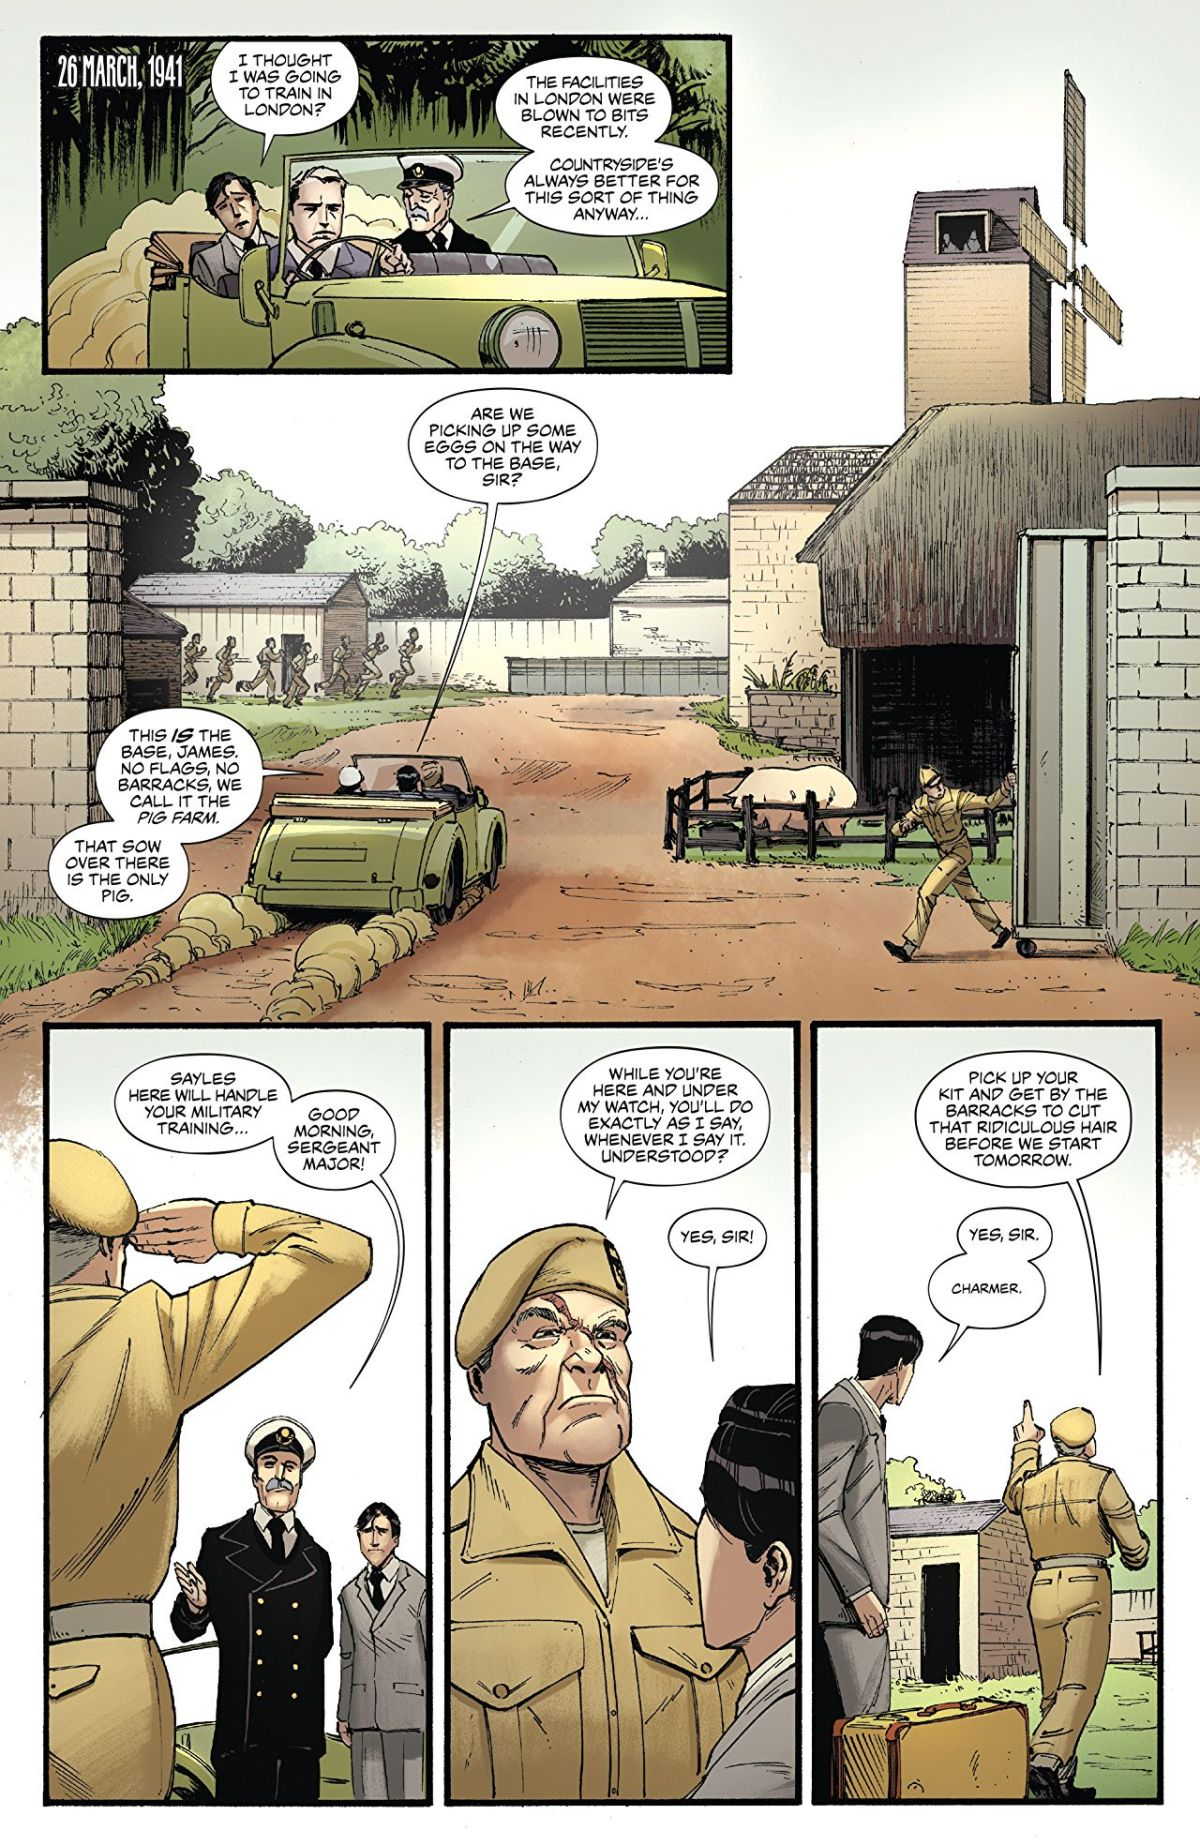 James Bond Origin Overview Of A Notable Spy Thriller Comics 3